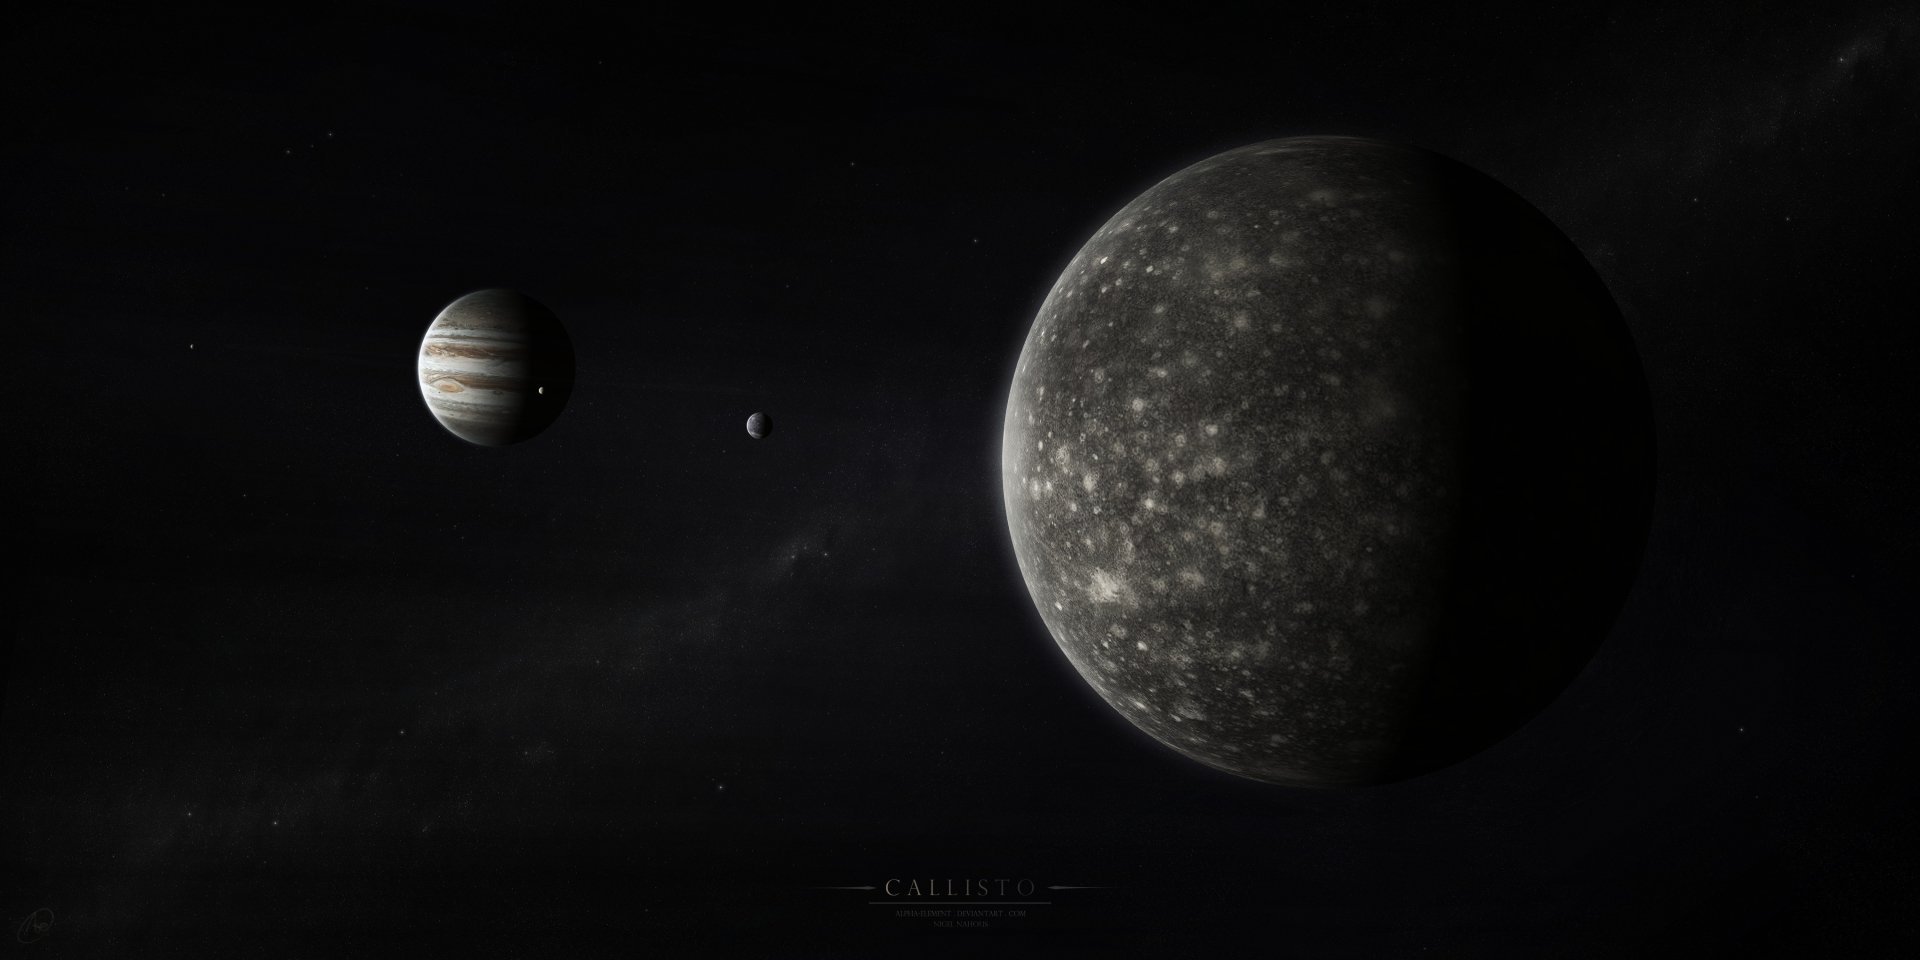 Jupiter 5k retina ultra hd wallpaper and background image - Jupiter wallpaper ...